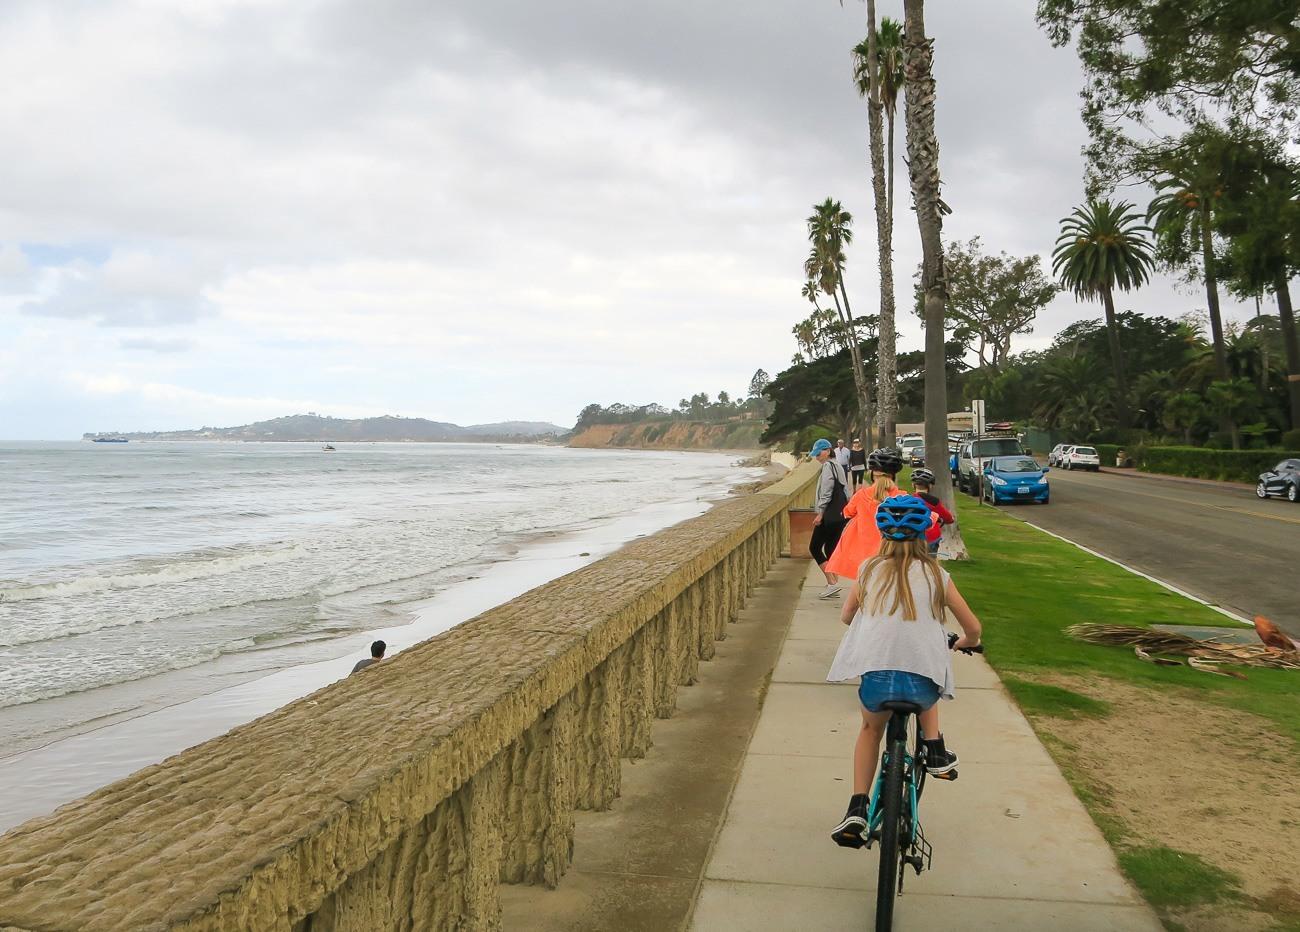 Biking from Montecito to Stearns Wharf in Santa Barbara